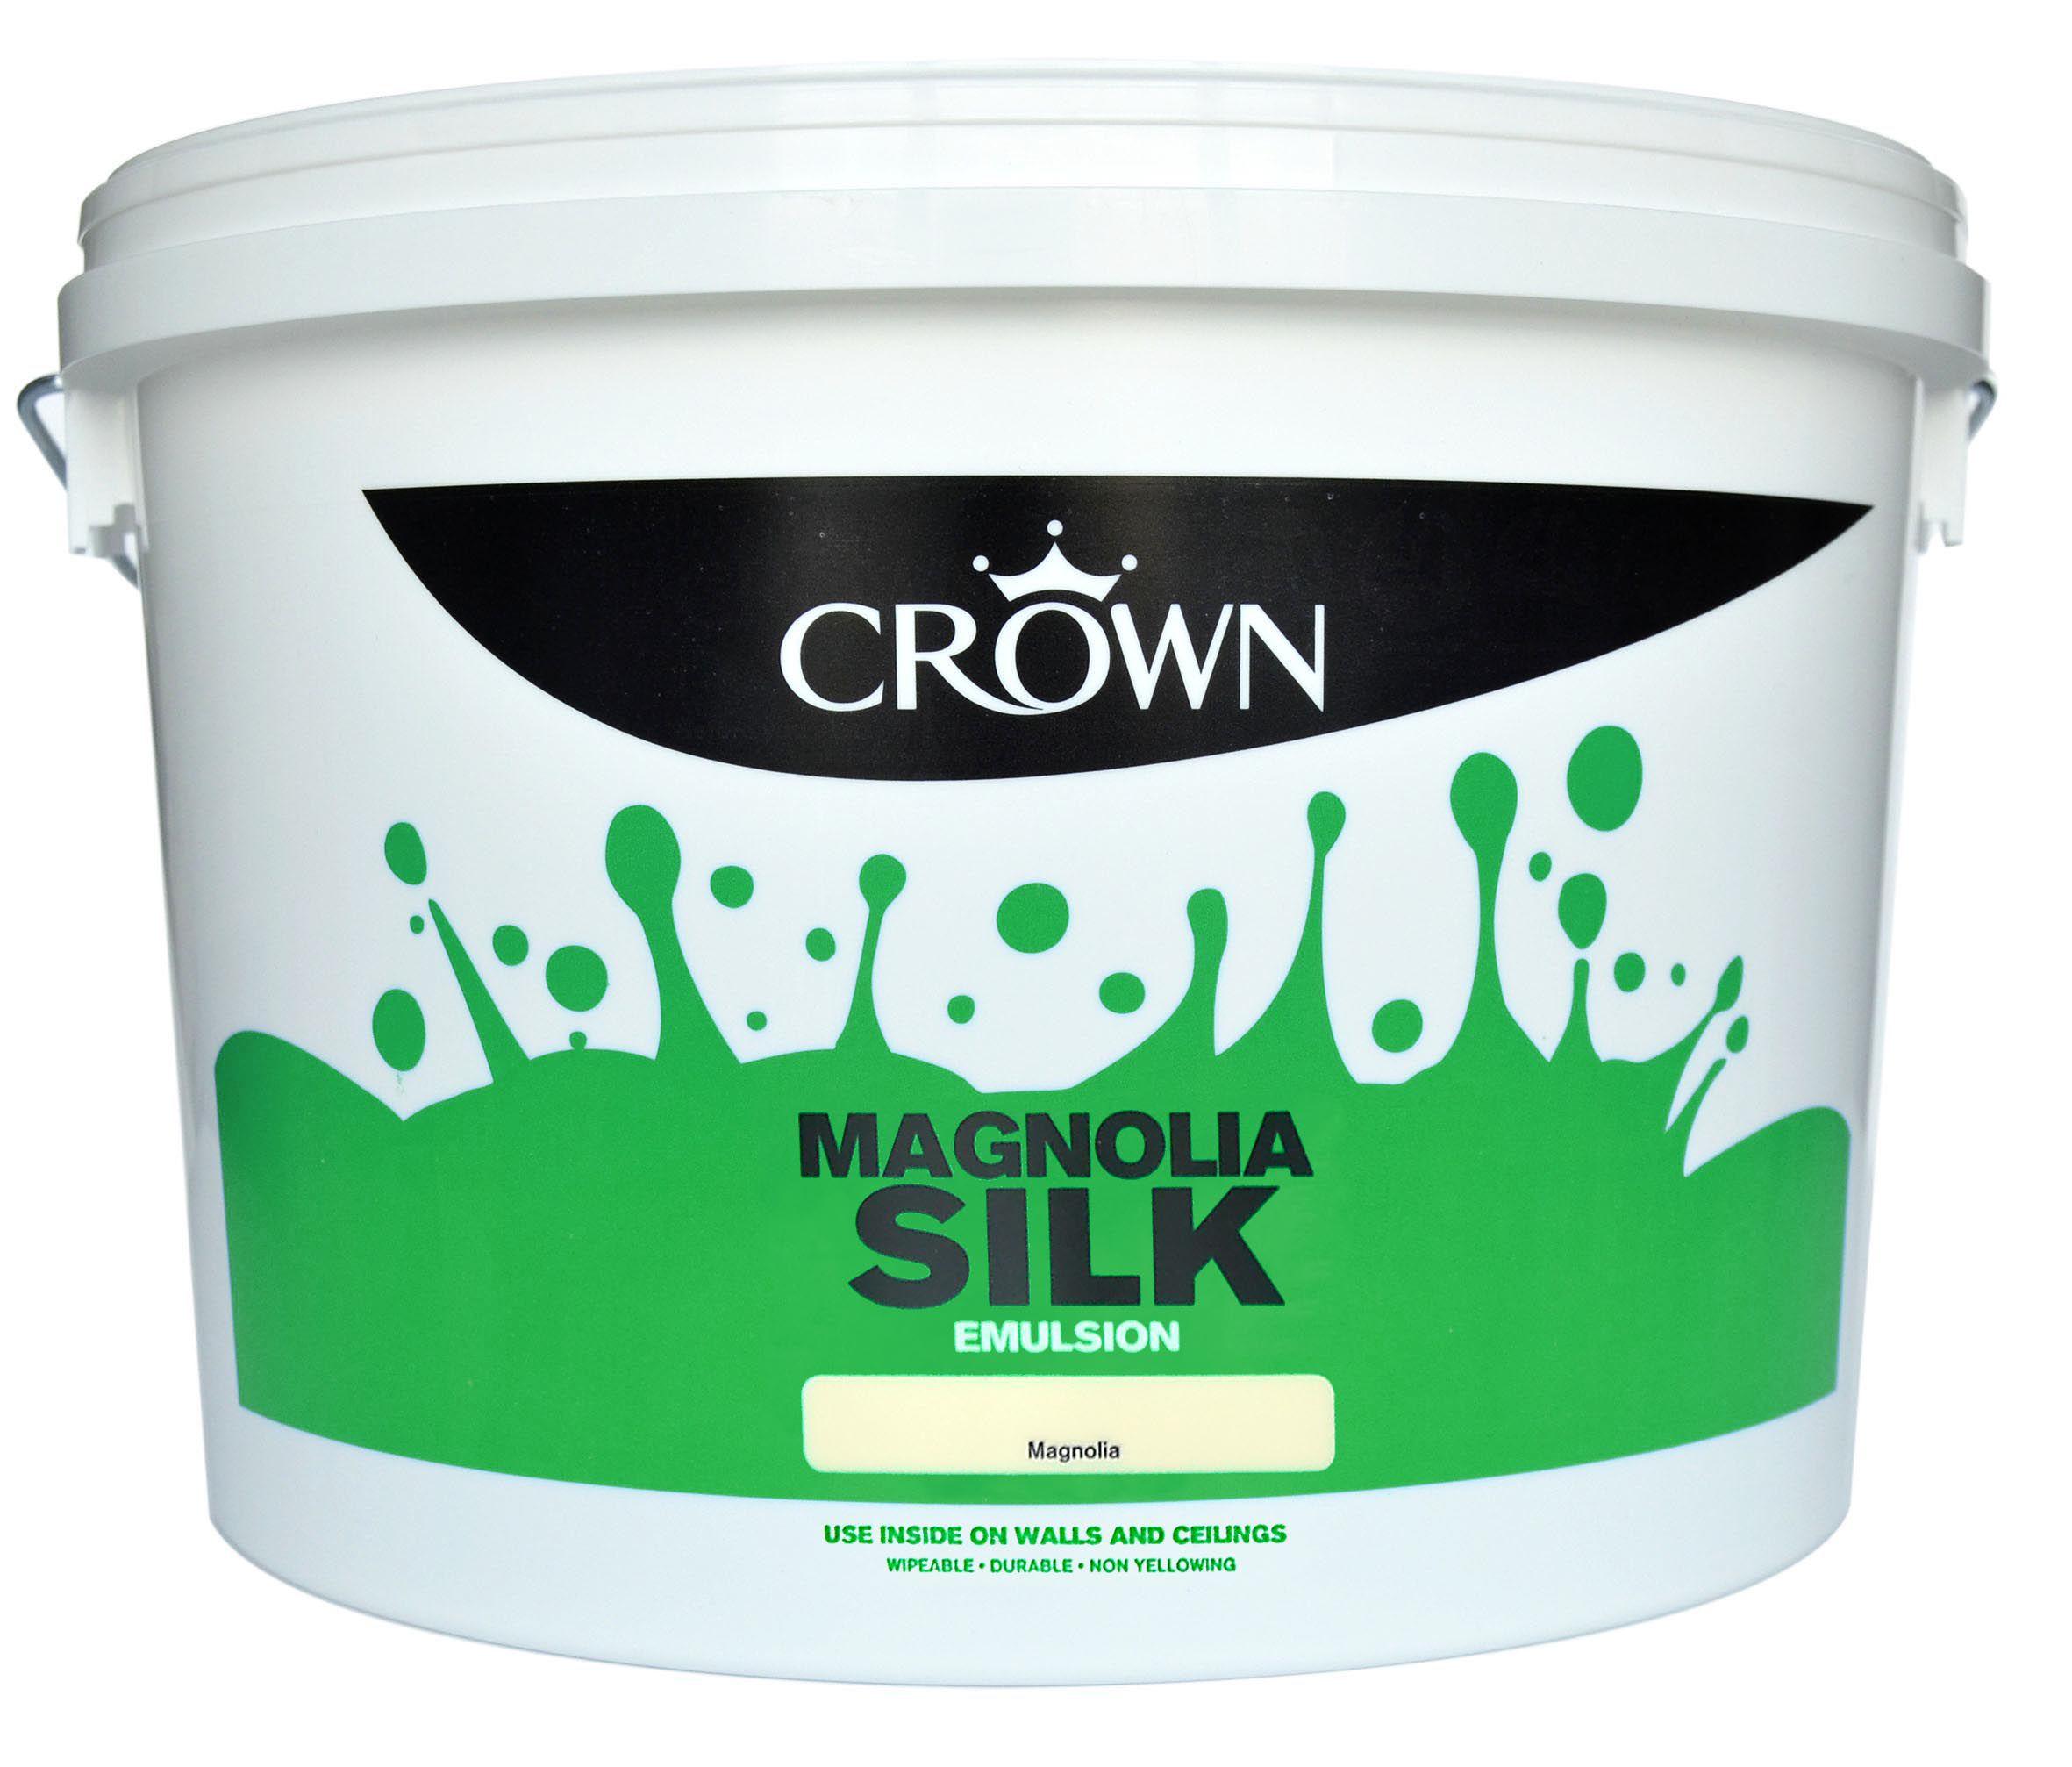 Crown Magnolia Silk Emulsion Paint 10l Departments Diy At B Amp Q